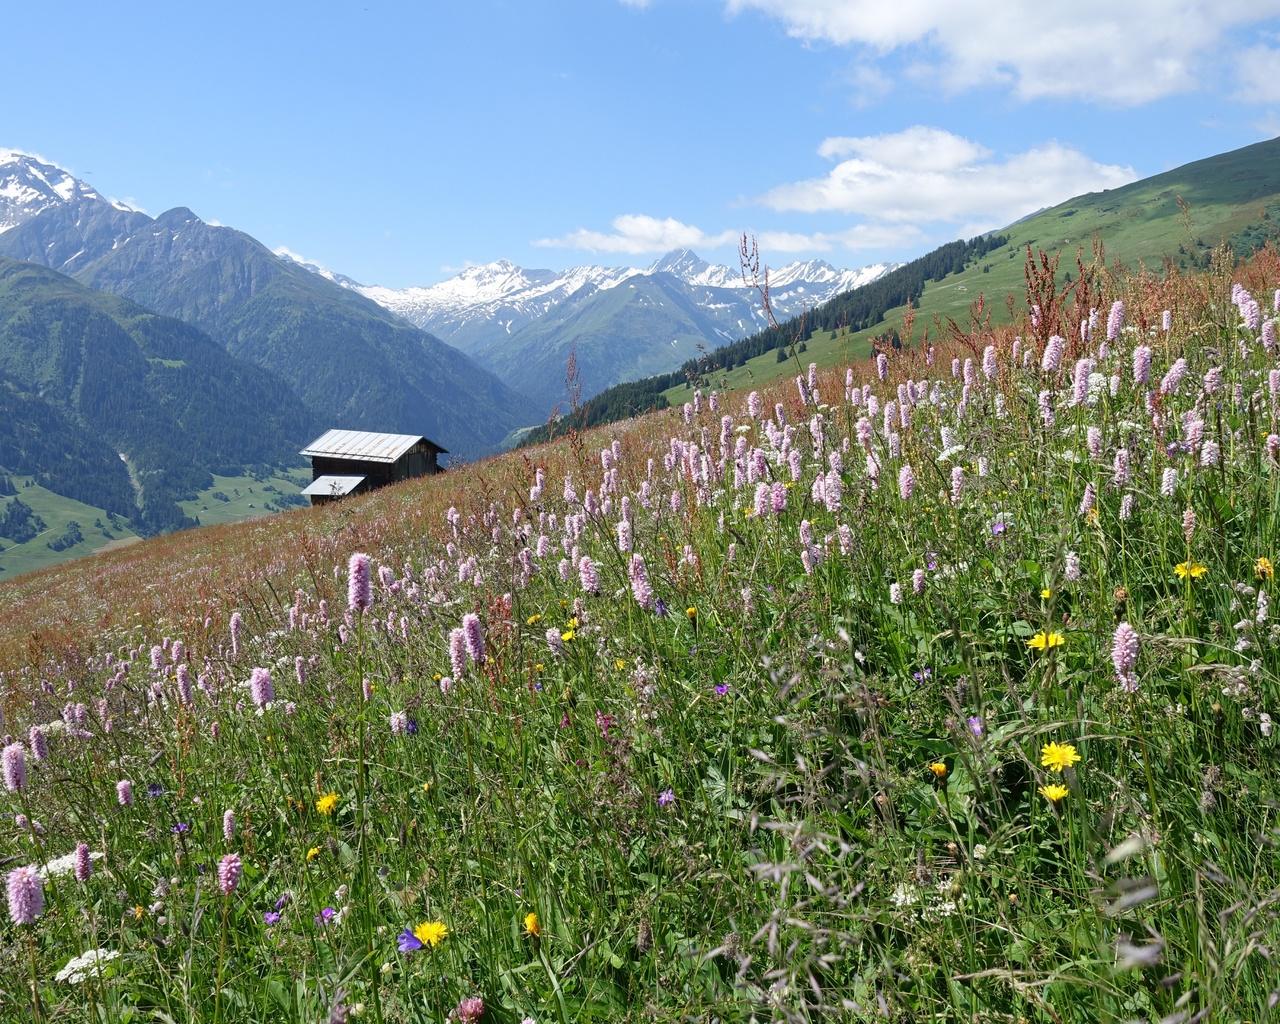 горы, швейцария, луг, grisons, трава, природа